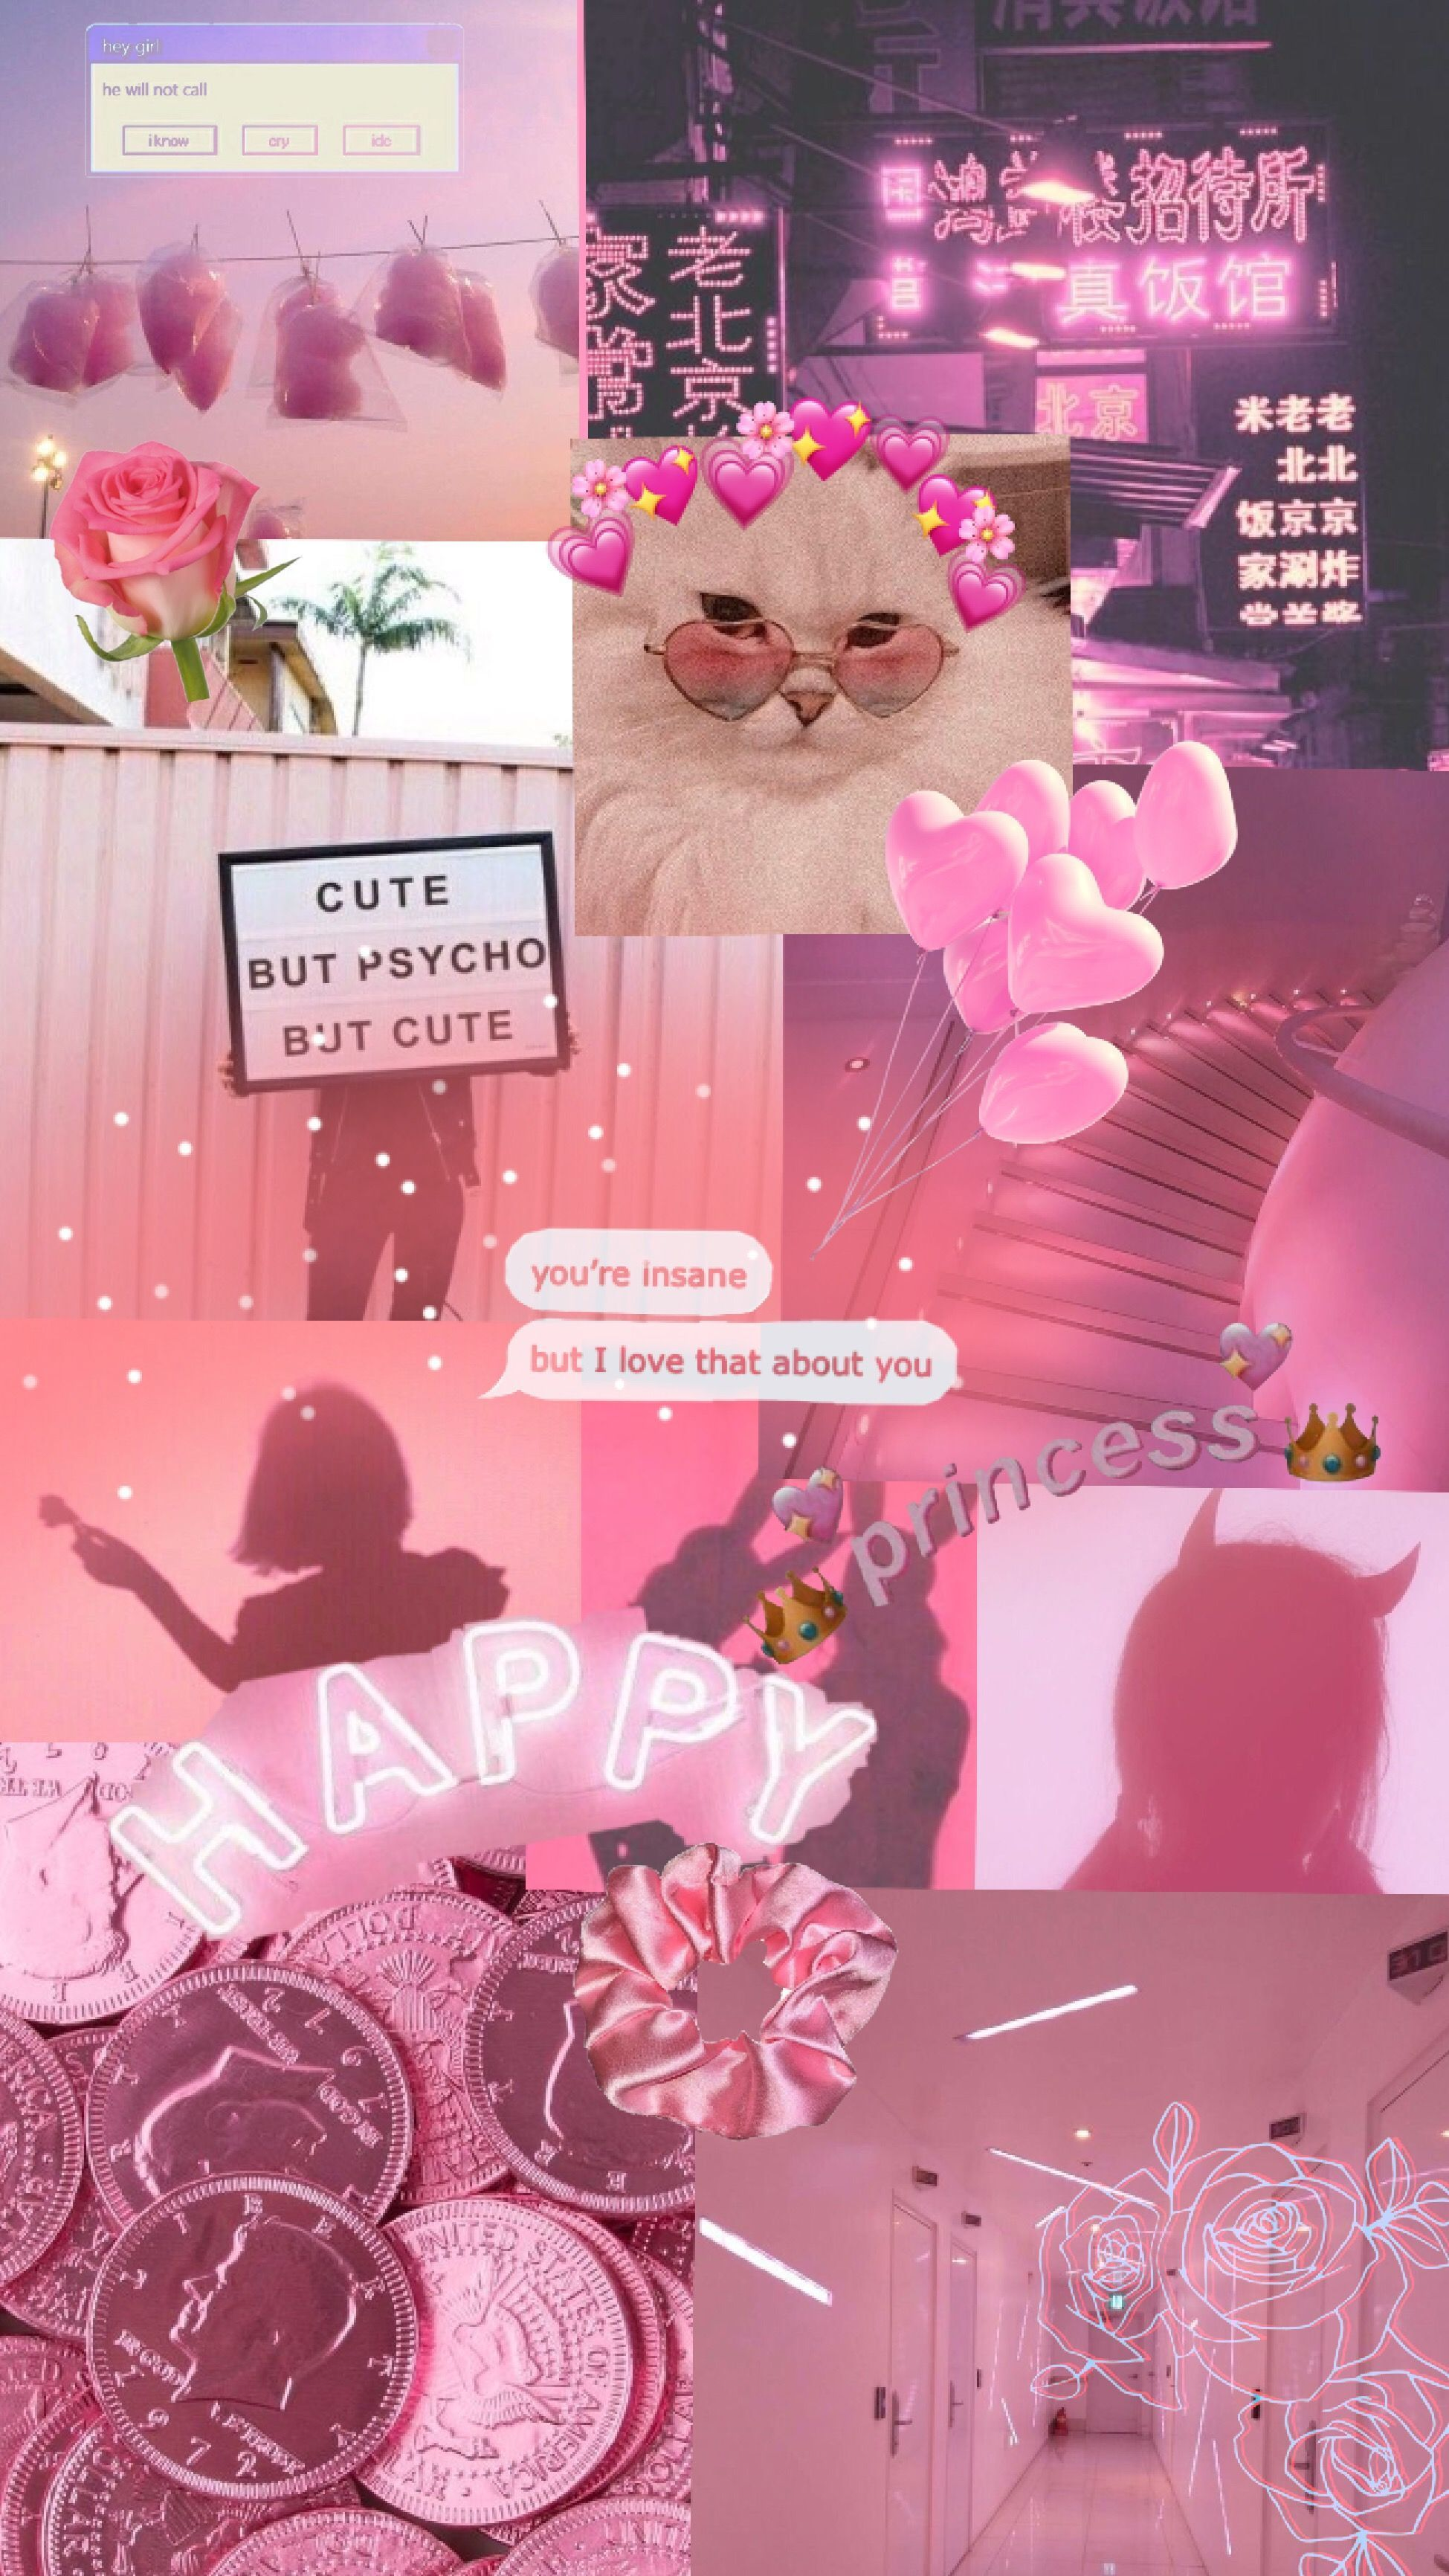 Girly Wallpaper In 2020 Pink Wallpaper Iphone Aesthetic Iphone Wallpaper Iphone Wallpaper Images Aesthetic Iphone Wallpaper Pink Wallpaper Iphone Pretty Wallpaper Iphone